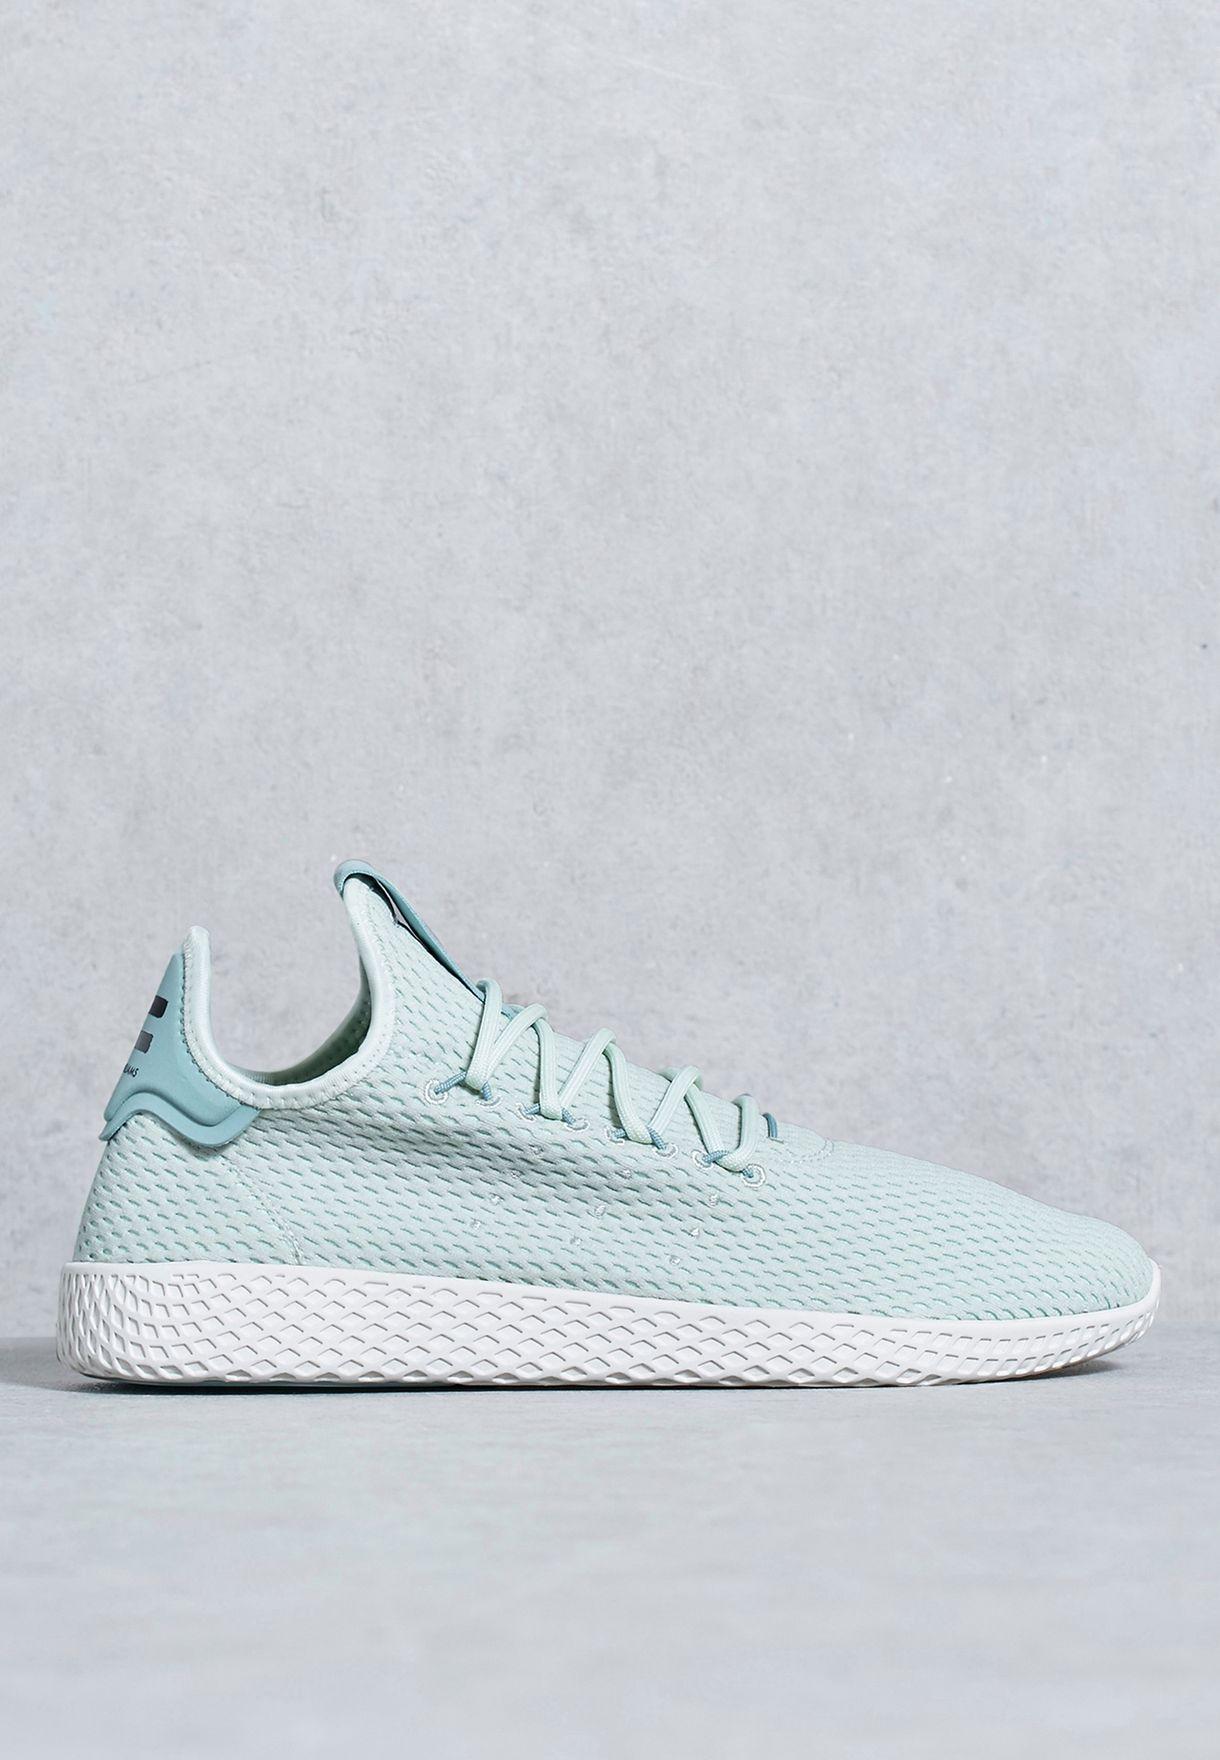 7ce8722b0 Shop adidas Originals green Pharrell Tennis Hu CP9765 for Men in ...